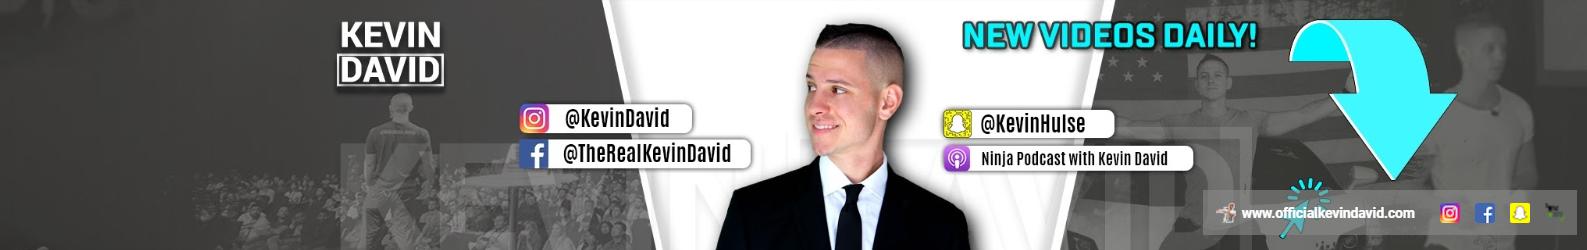 Kevin David YouTube Banner